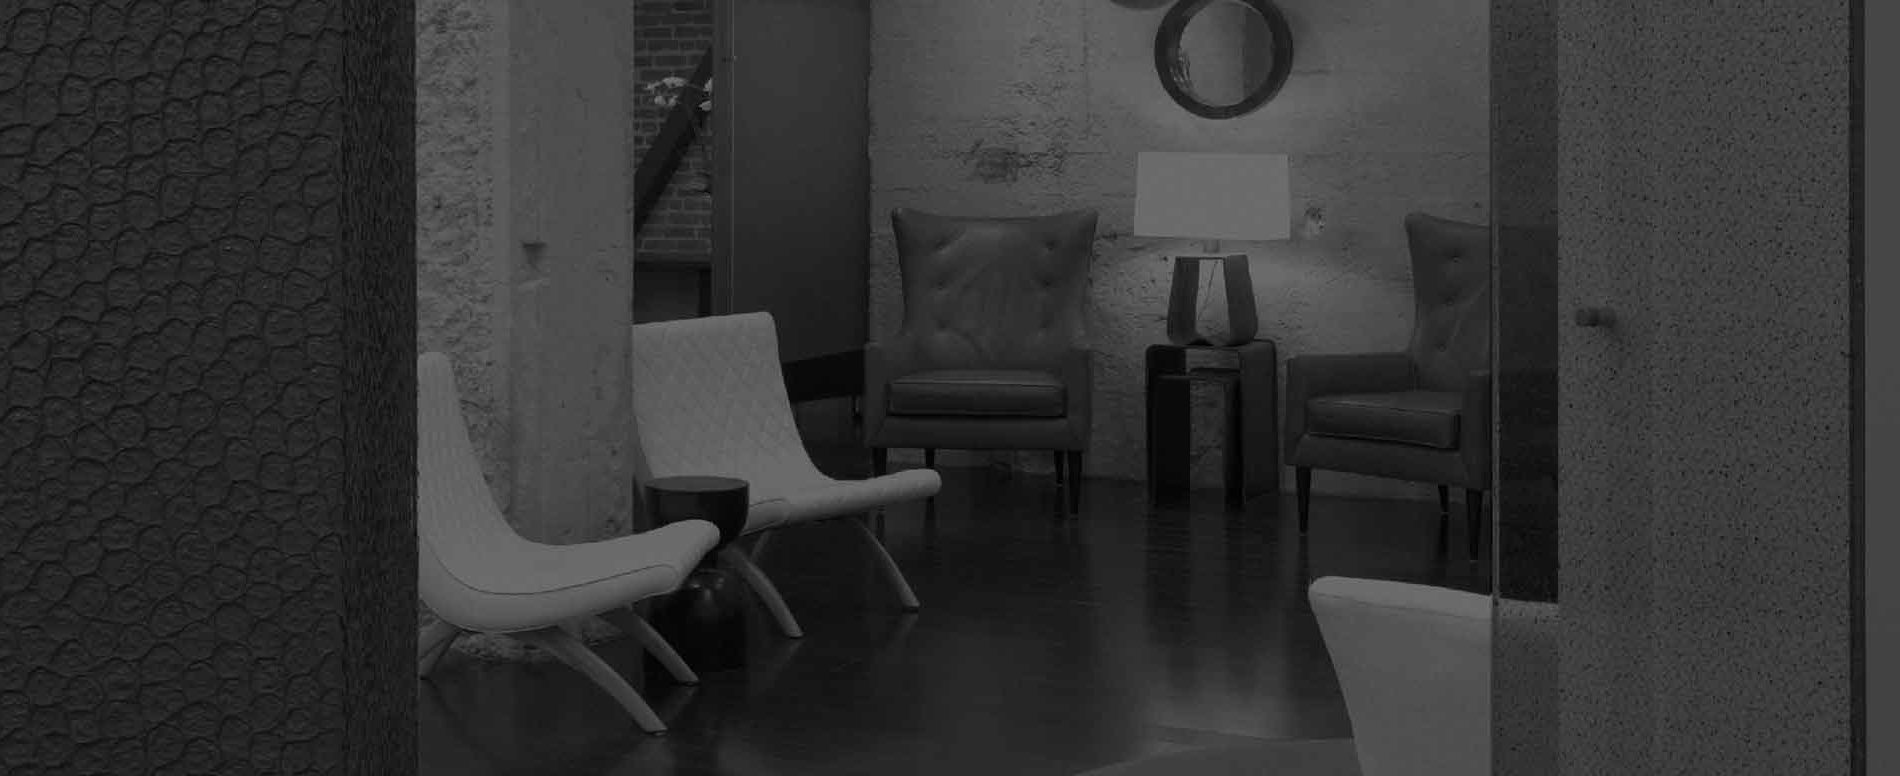 B&W image of a stylish waiting room.